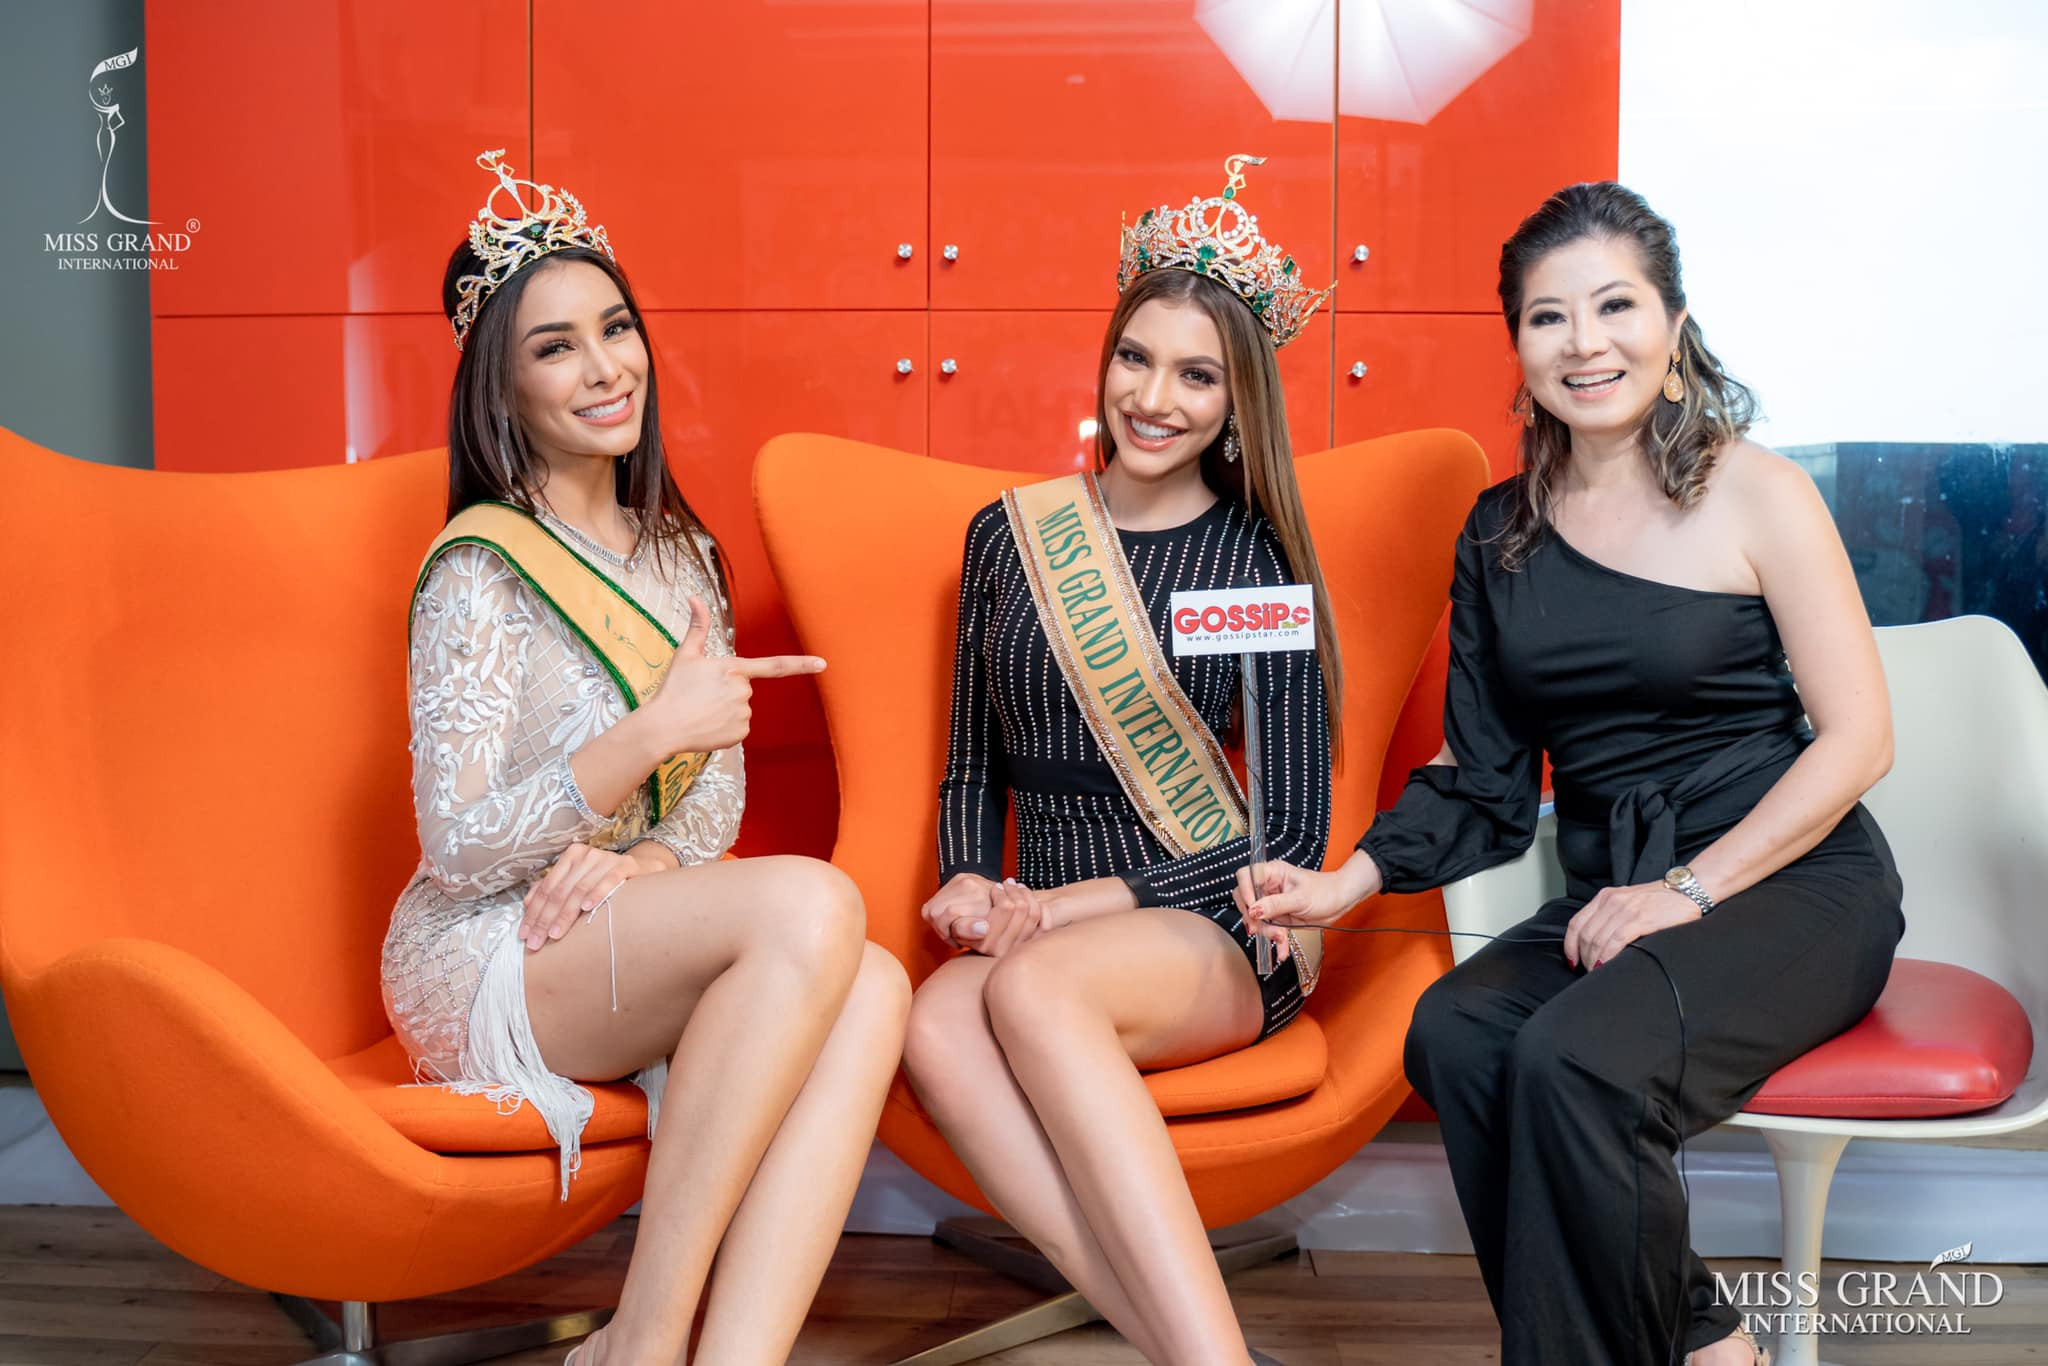 lourdes valentina figuera, miss grand international 2019. - Página 22 Fekdq910